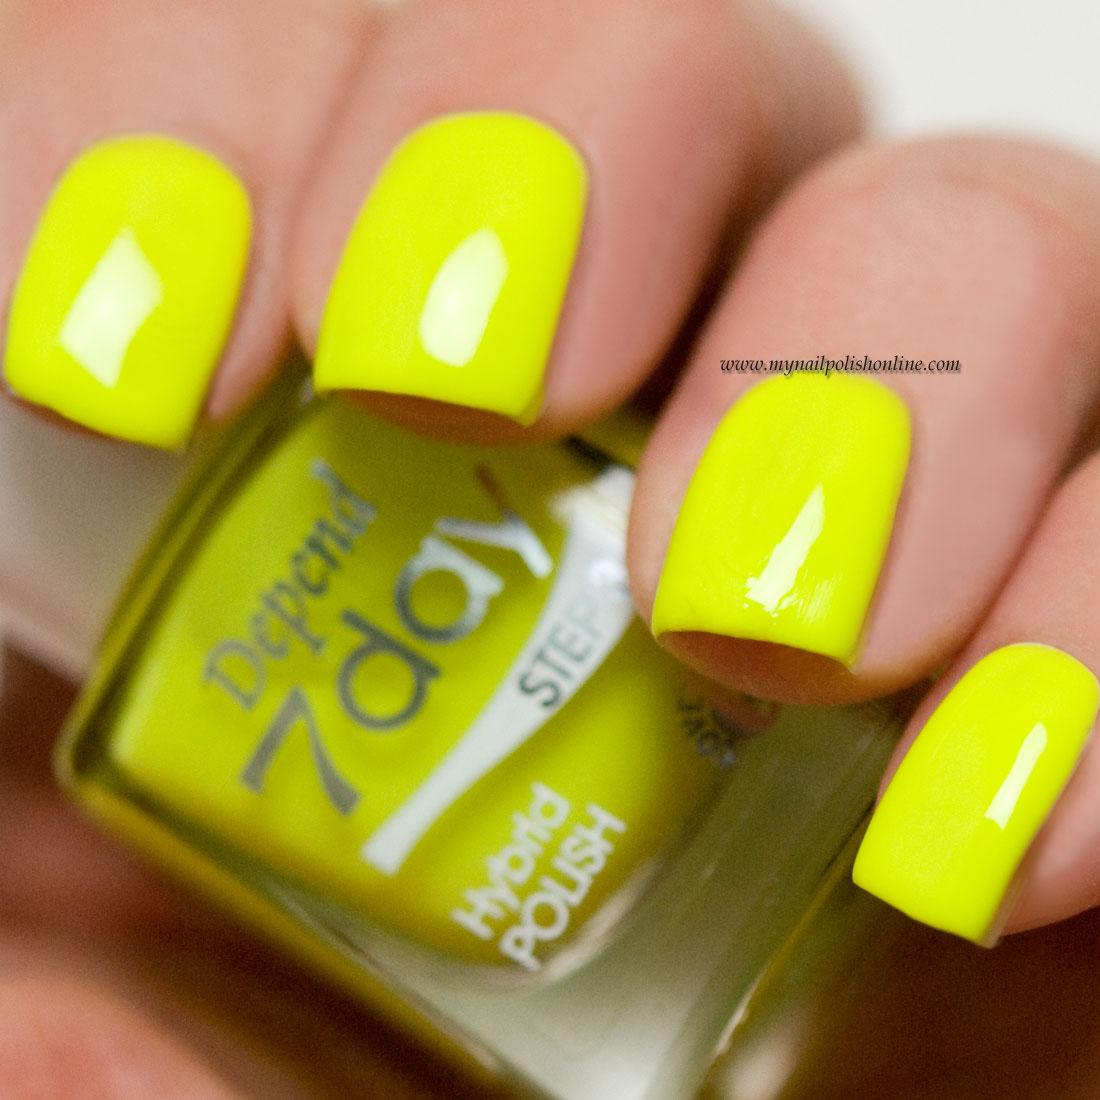 Neon Nail Polish Online: My Nail Polish Online